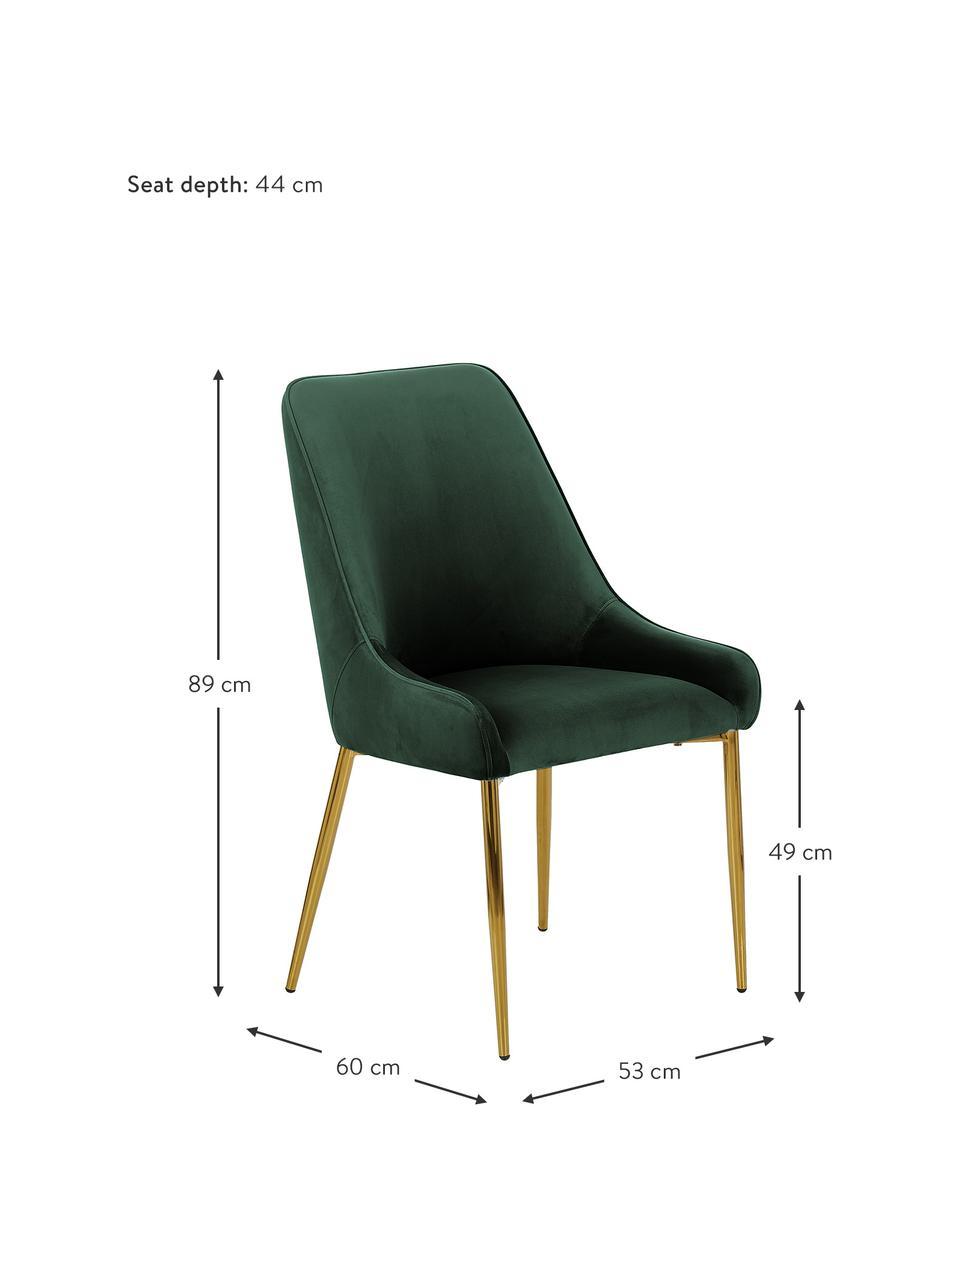 Samt-Polsterstuhl Ava in Dunkelgrün, Bezug: Samt (100% Polyester) Der, Beine: Metall, galvanisiert, Samt Dunkelgrün, B 53 x T 60 cm